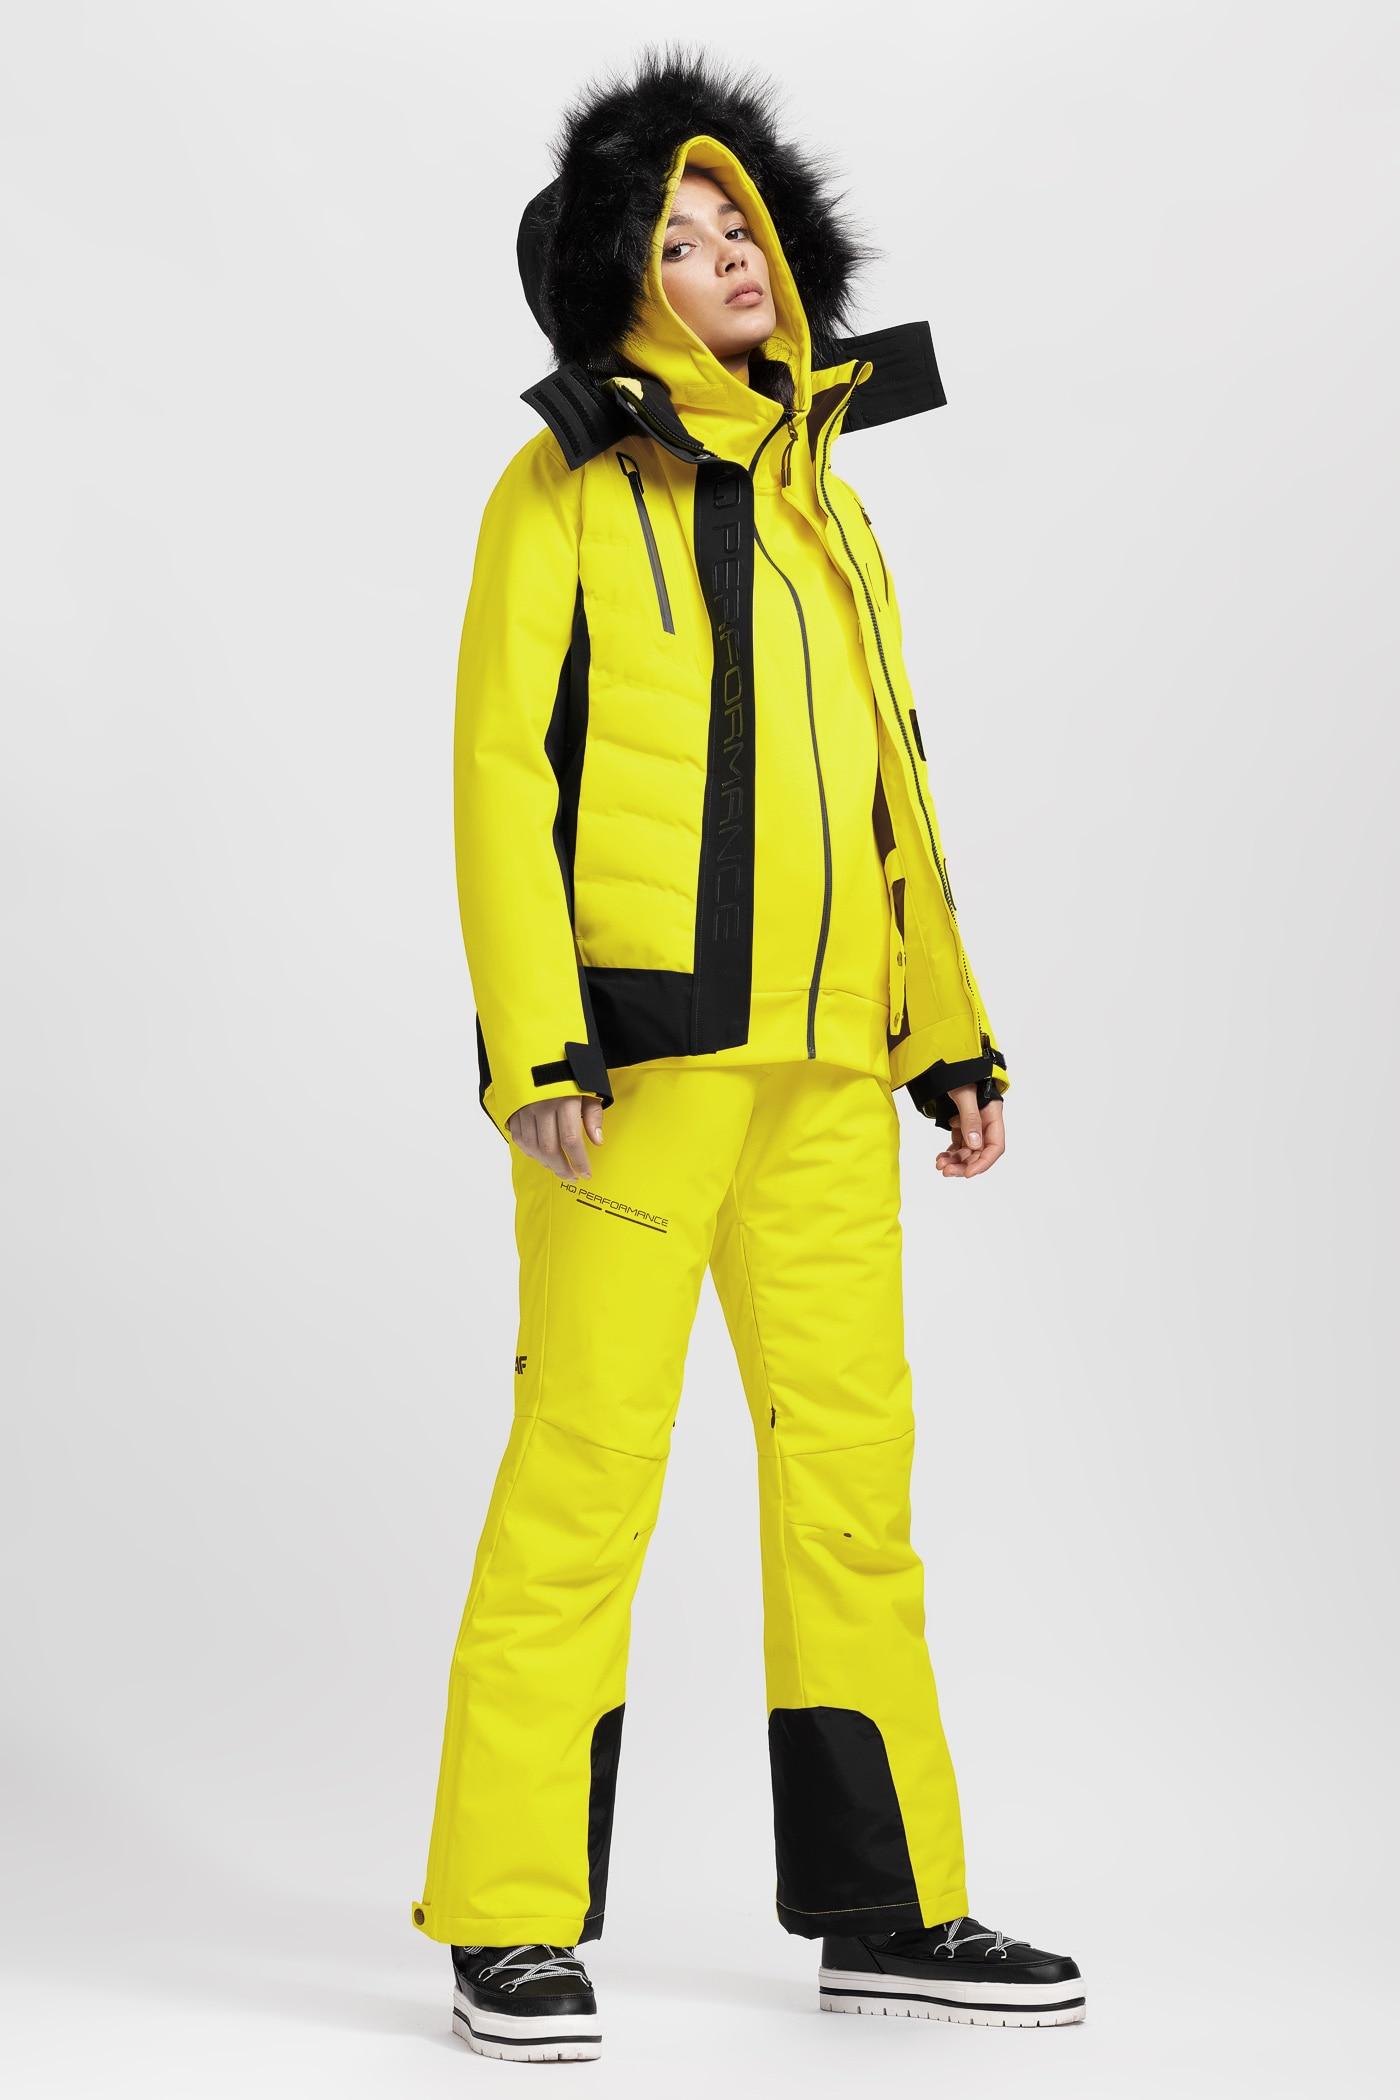 Kurtka narciarska damska KUDN161A - żółty